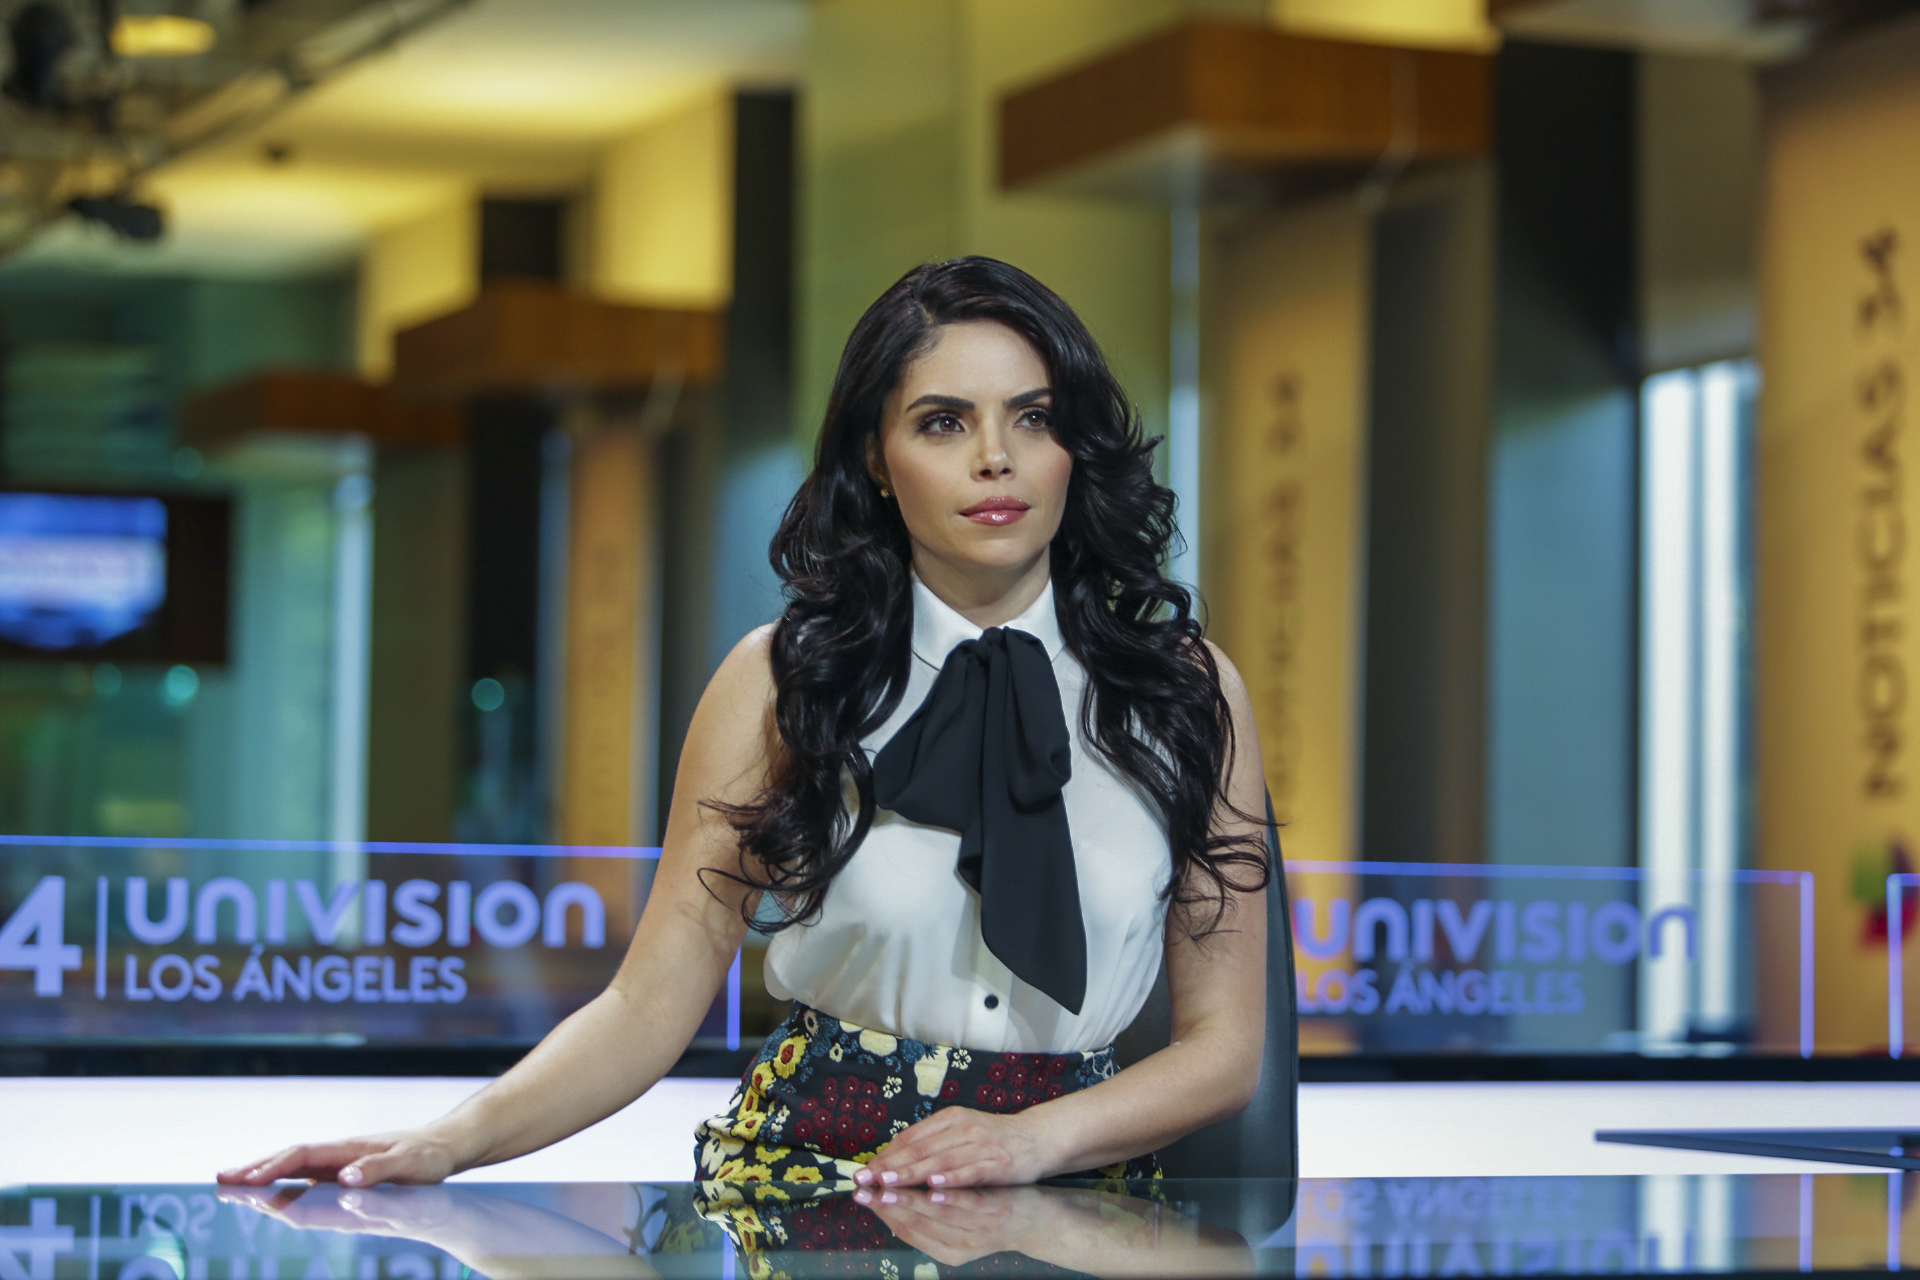 Meet Yarel Ramos of Edicion Digital California | Univision